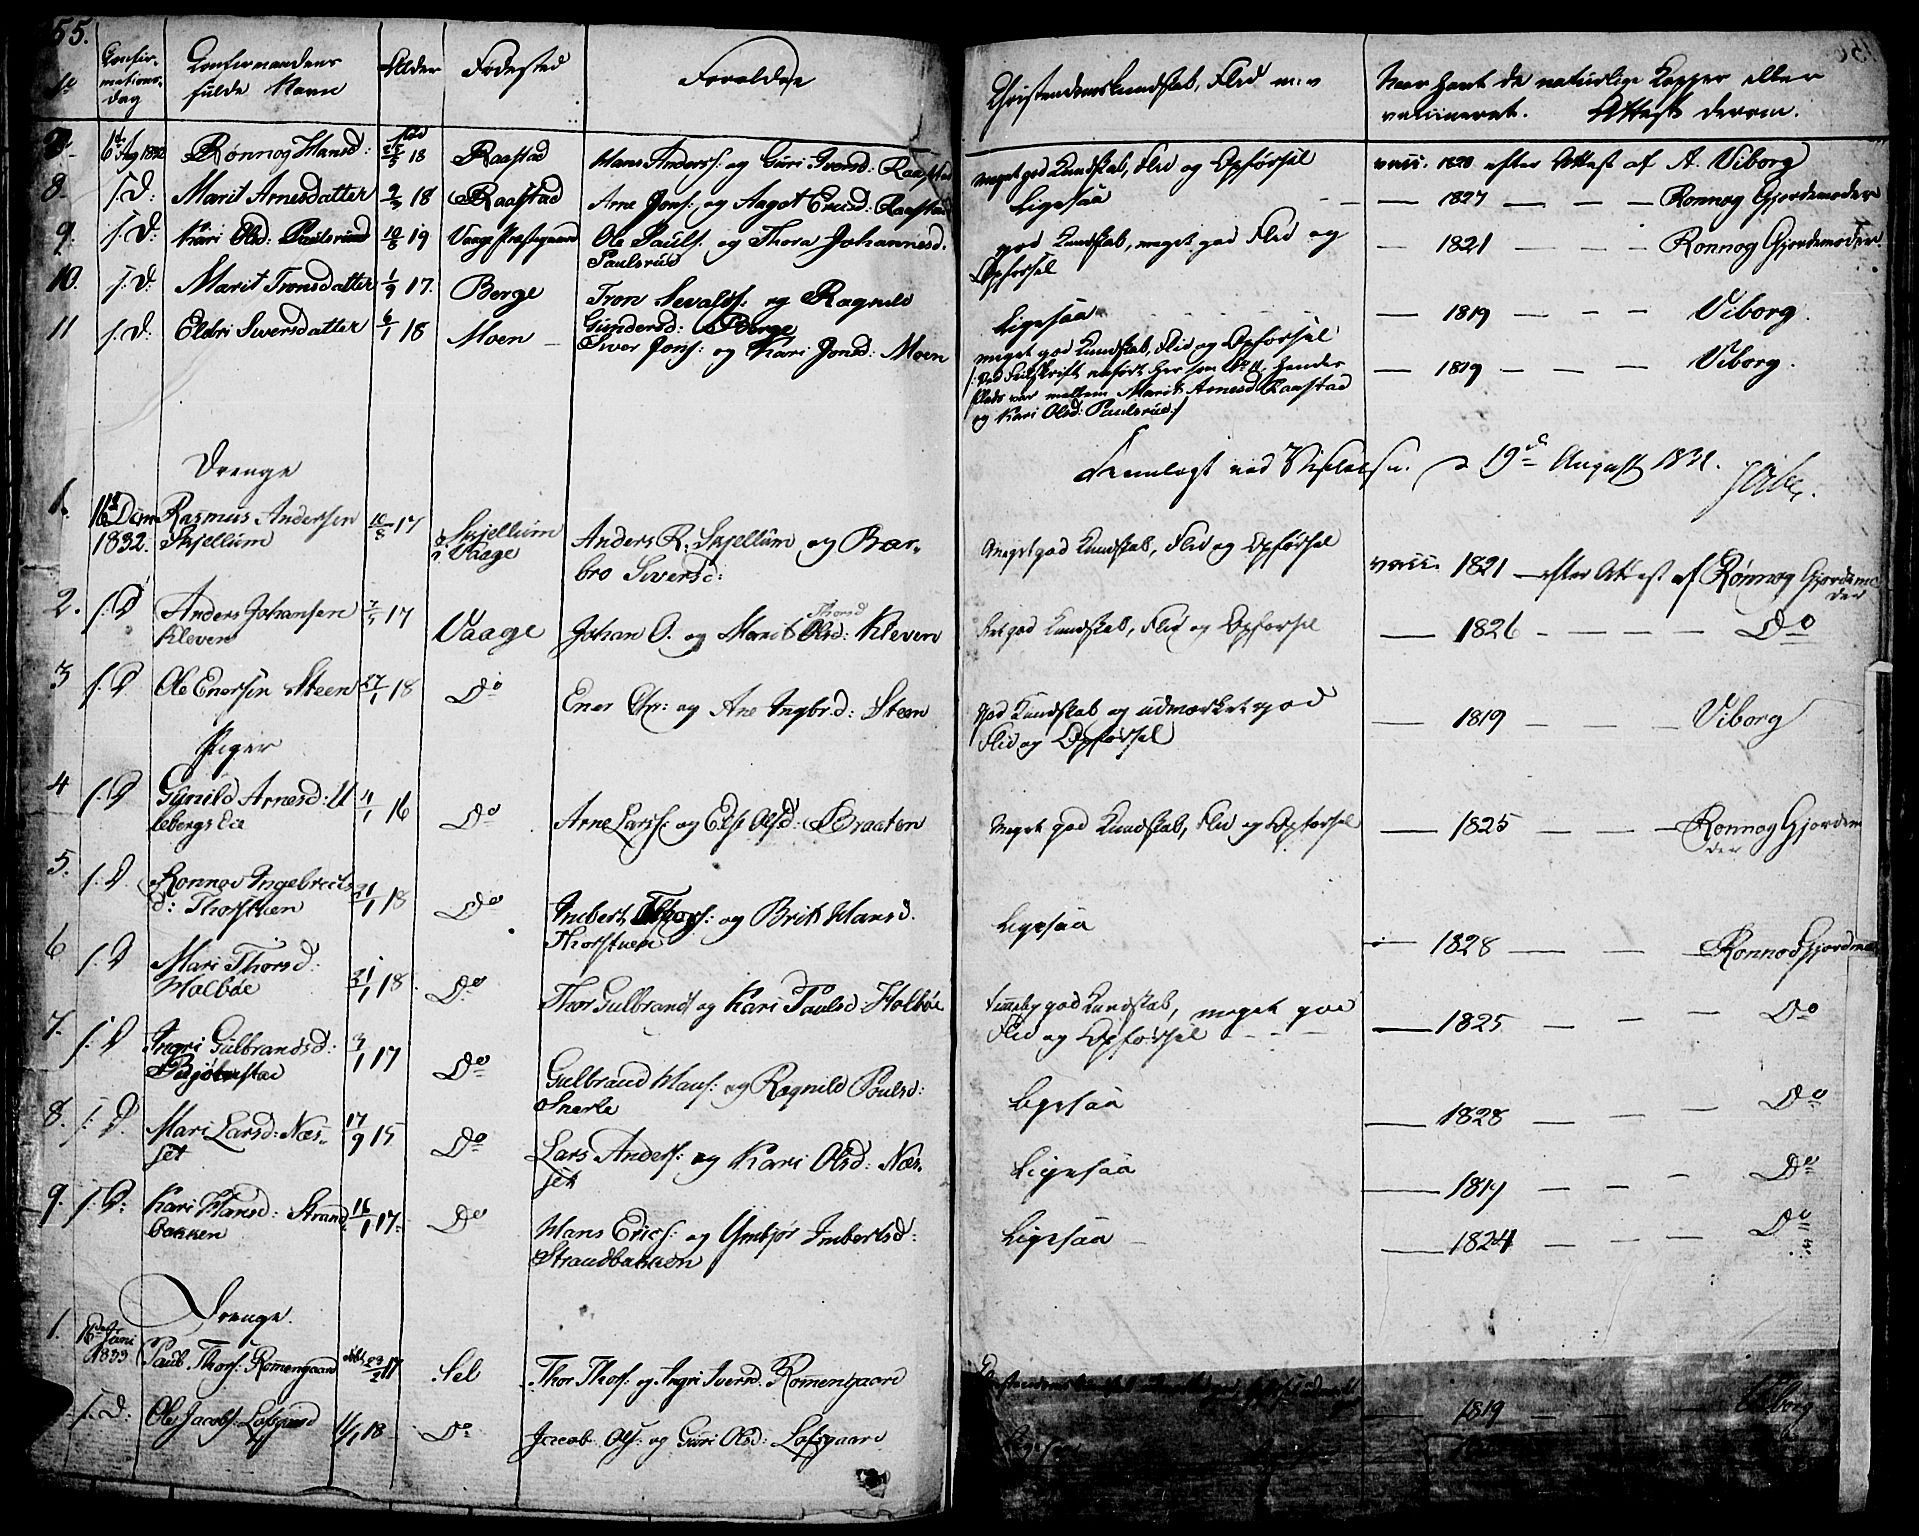 SAH, Vågå prestekontor, Ministerialbok nr. 4 /1, 1827-1842, s. 155